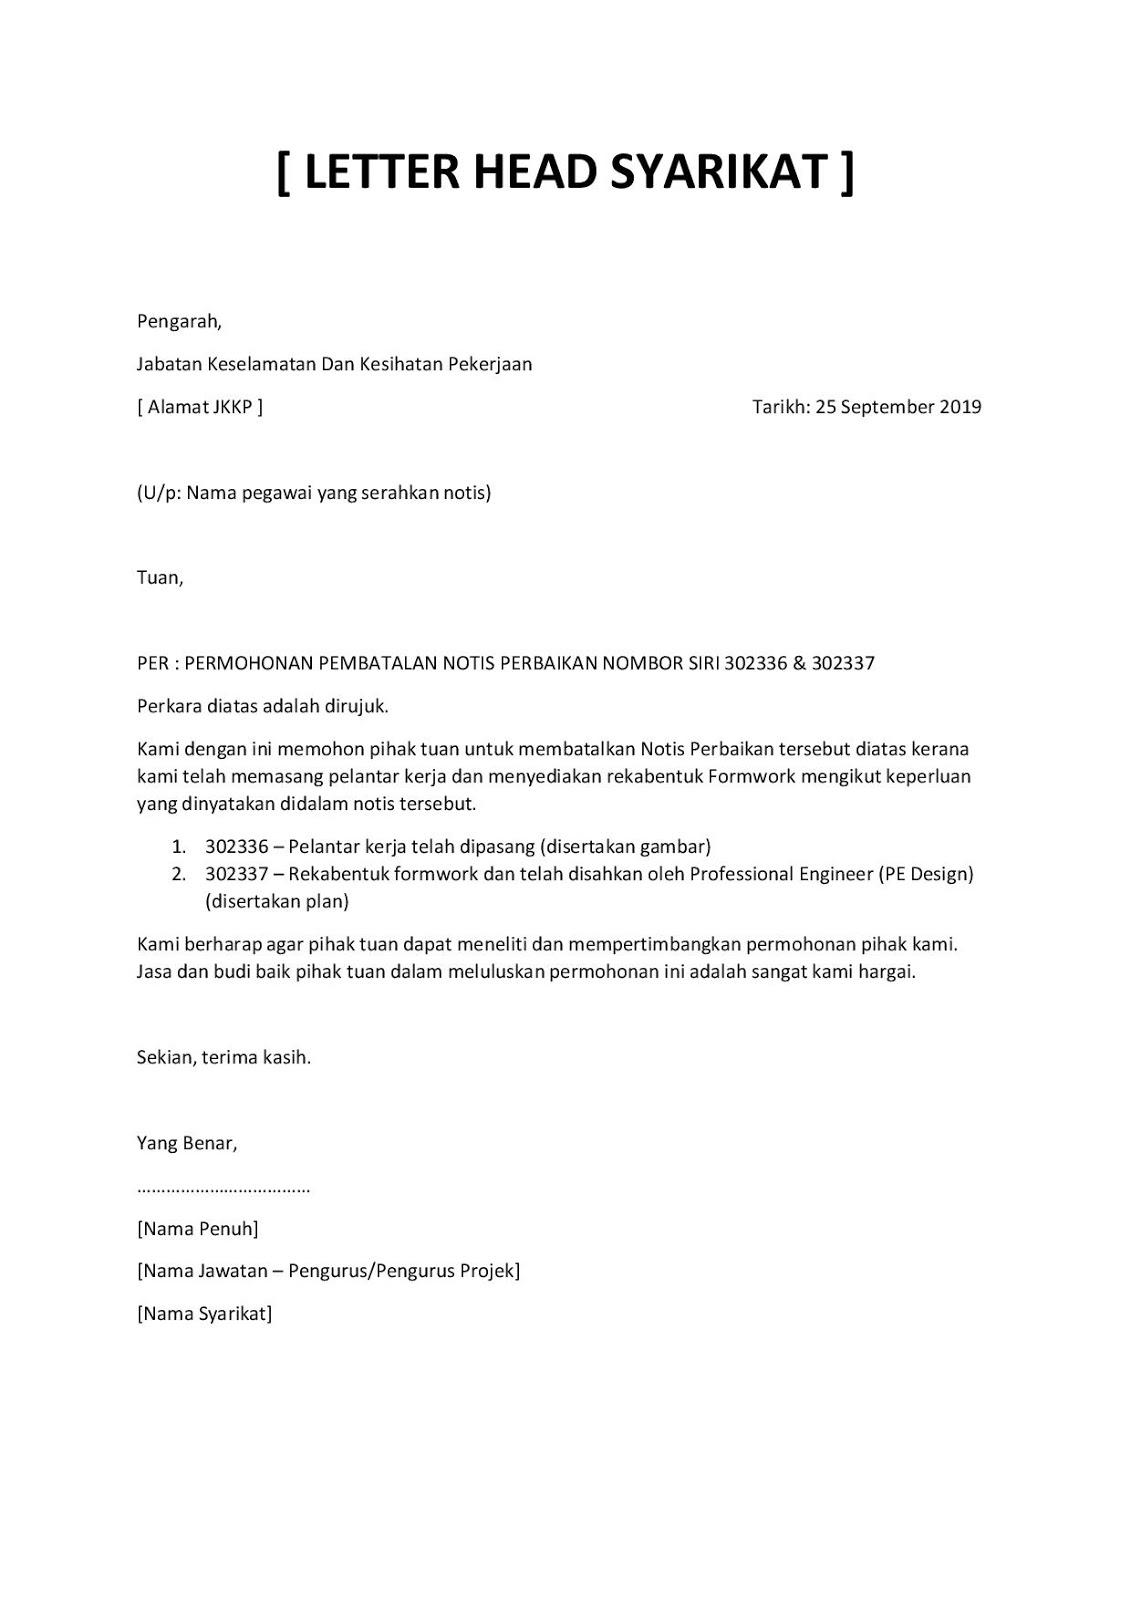 Contoh Surat Rasmi Permohonan Pembatalan Notis JKKP